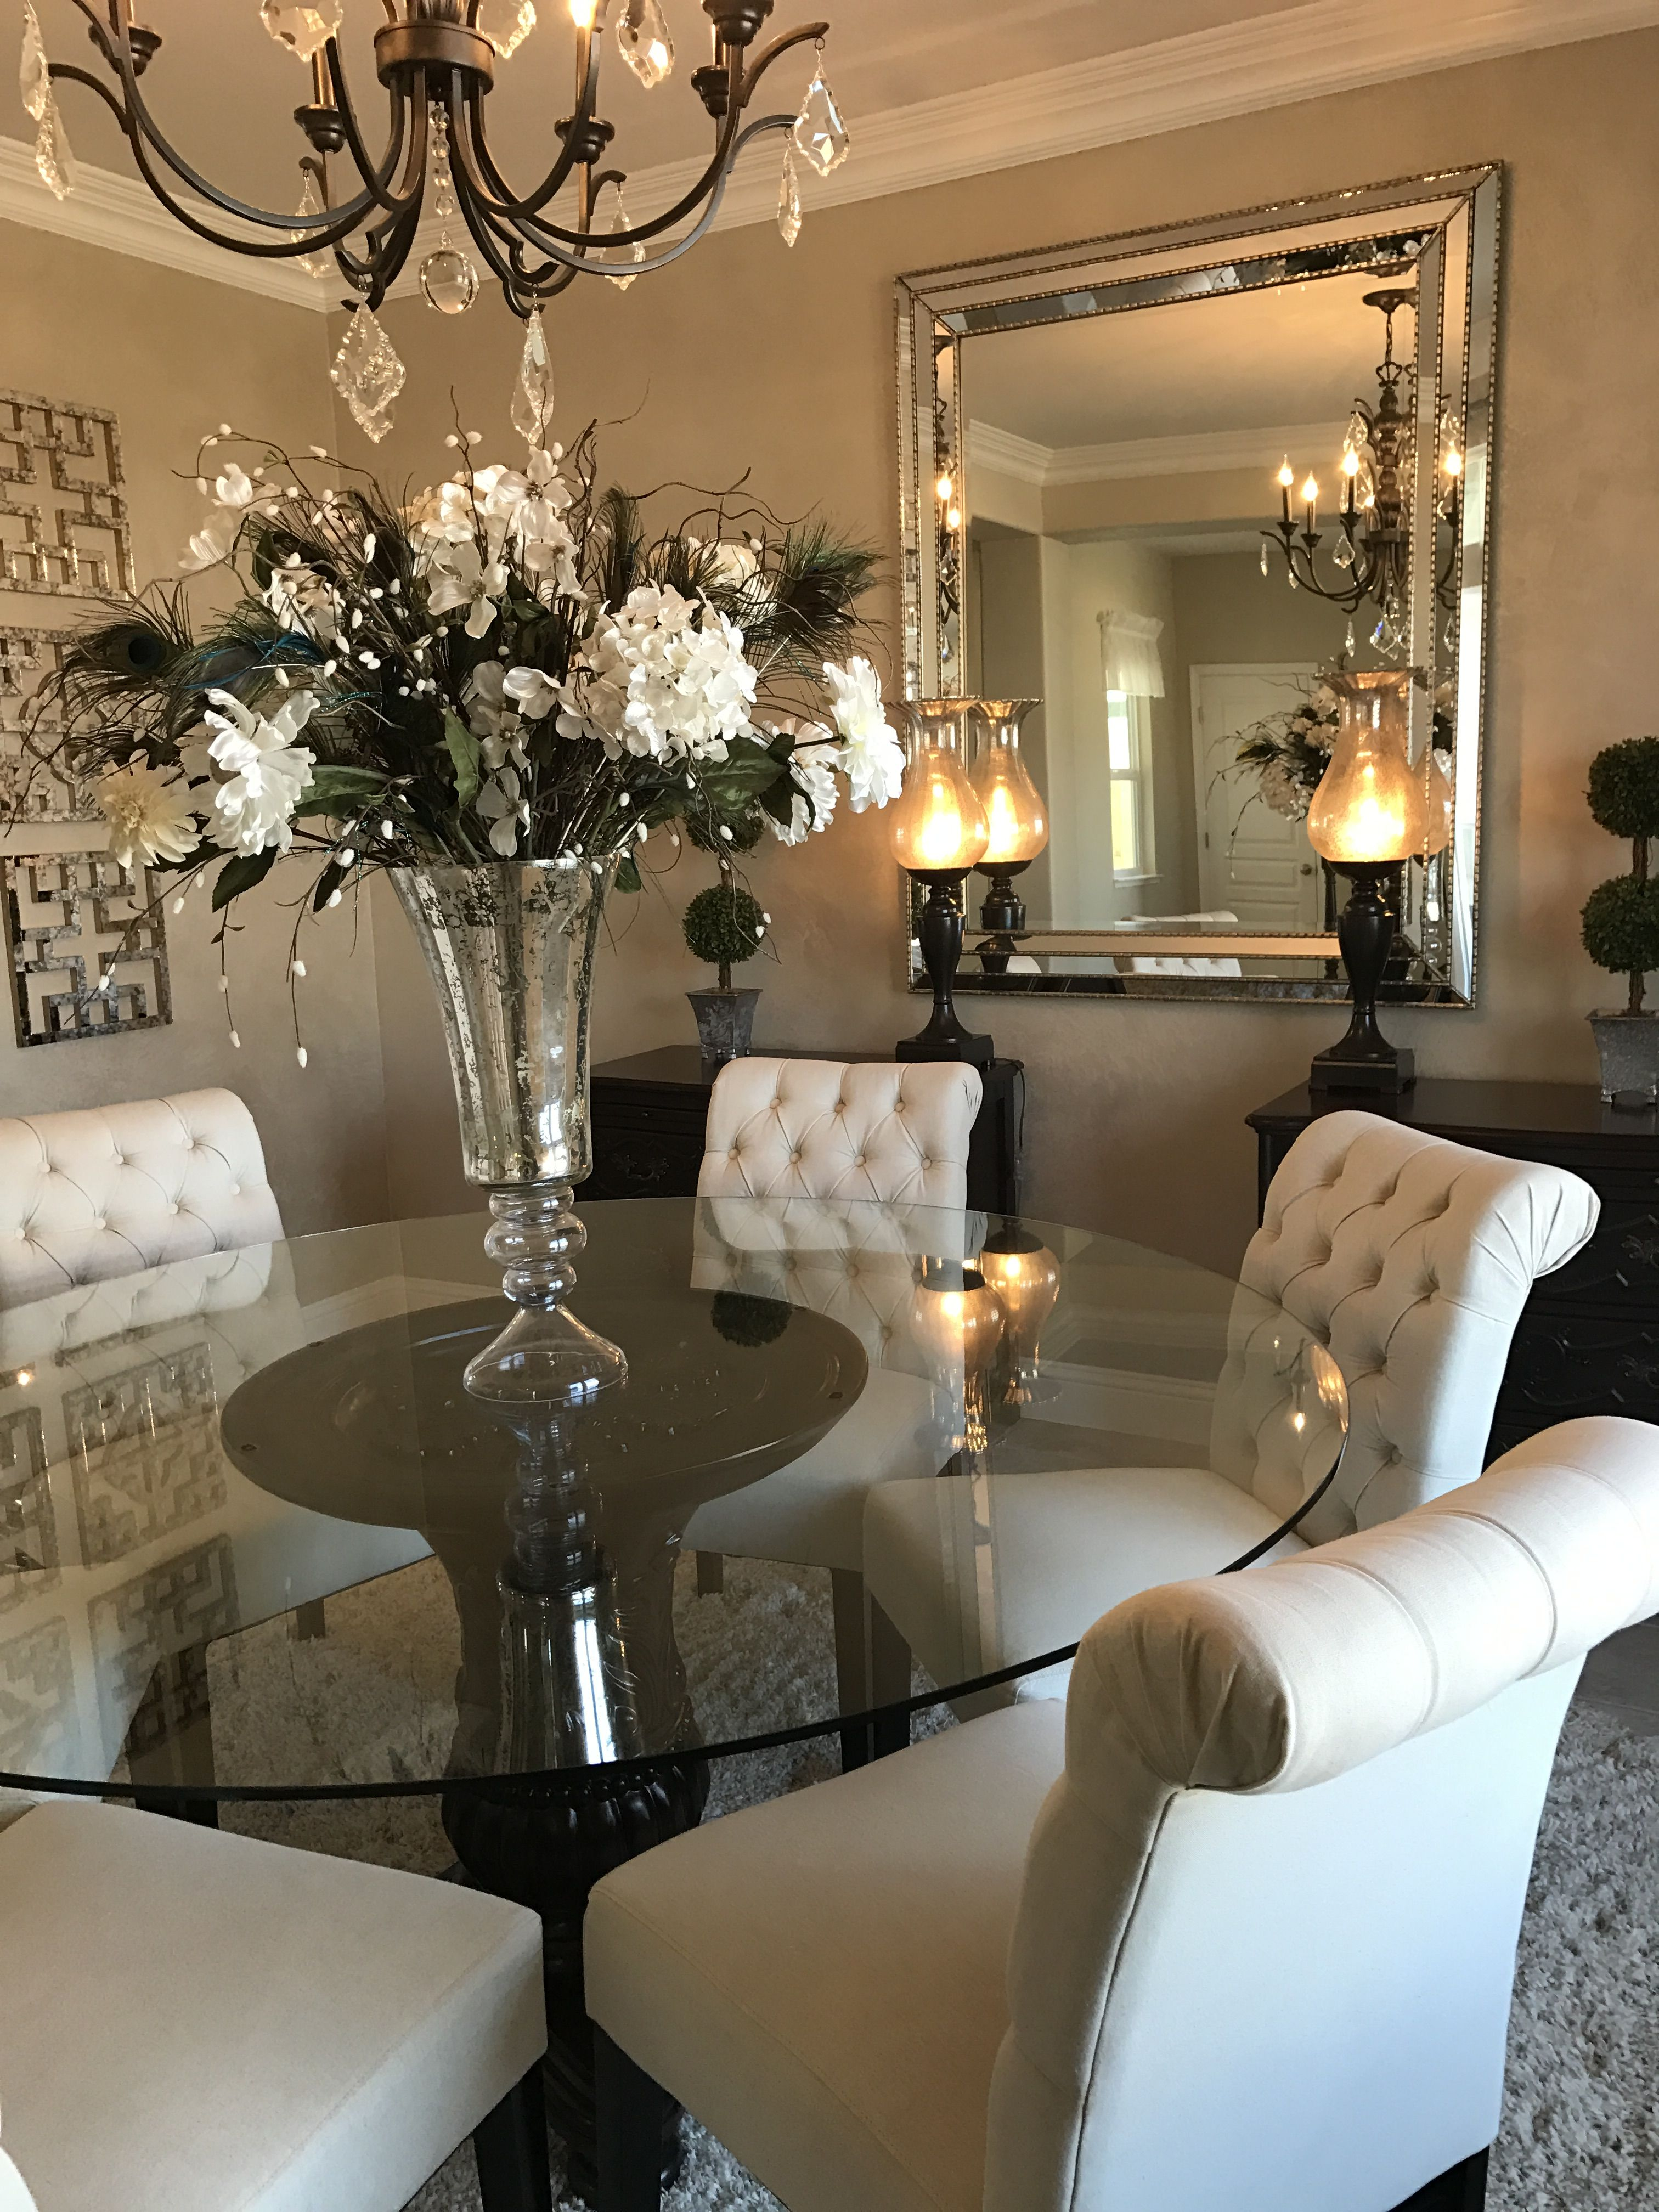 Comedores comedores hermosos home decor dining room y for Decoracion de cocinas comedores modernos